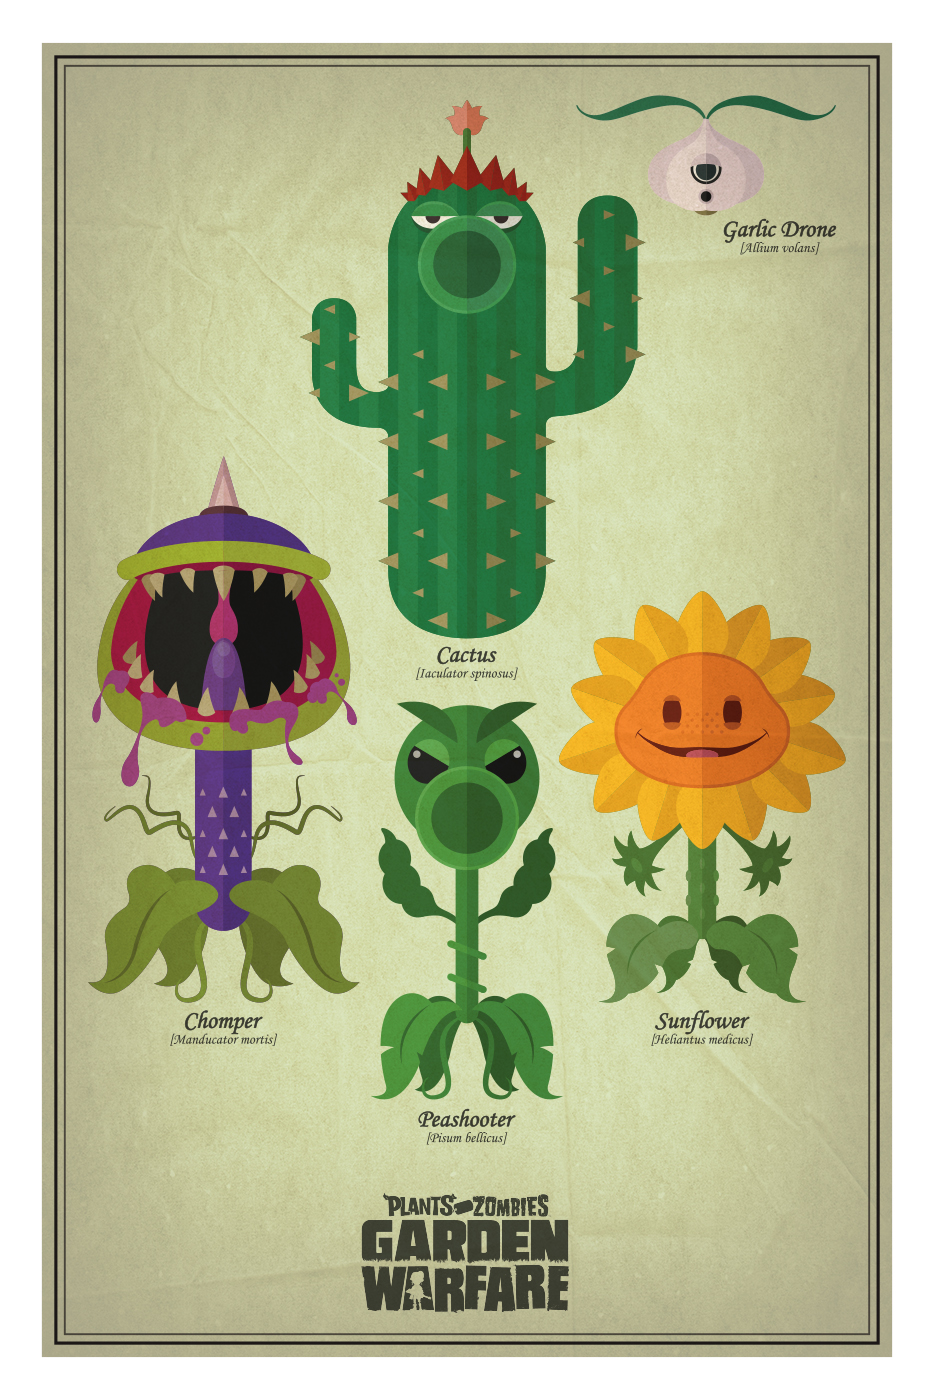 PvZ Garden Warfare - Herbarium warfare by mdk7